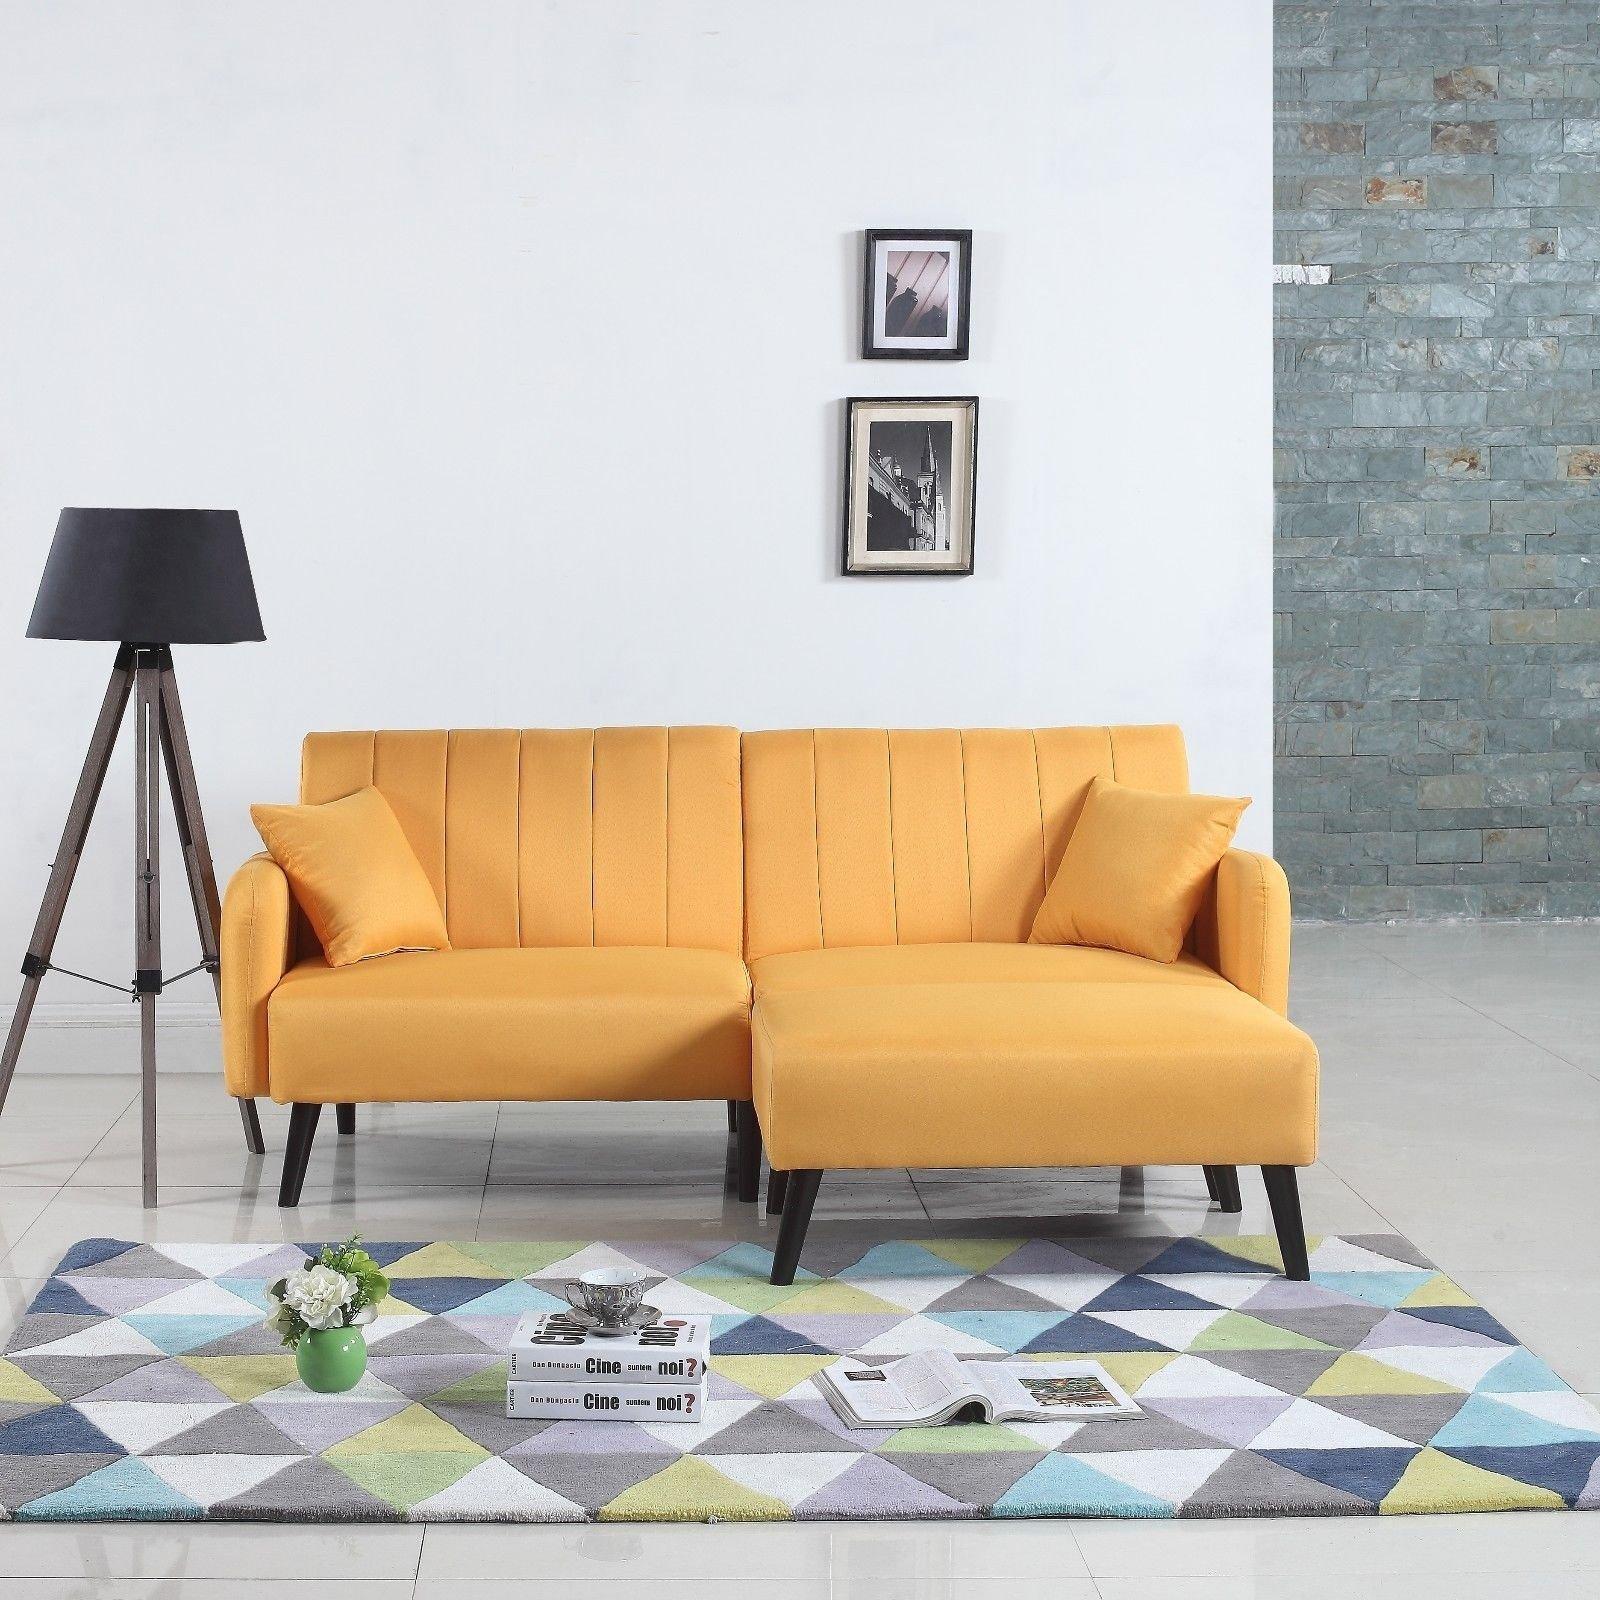 Strange Details About Mid Century Modern Linen Furniture Futon Sofa Living Room Sleeper Couch Yellow Short Links Chair Design For Home Short Linksinfo